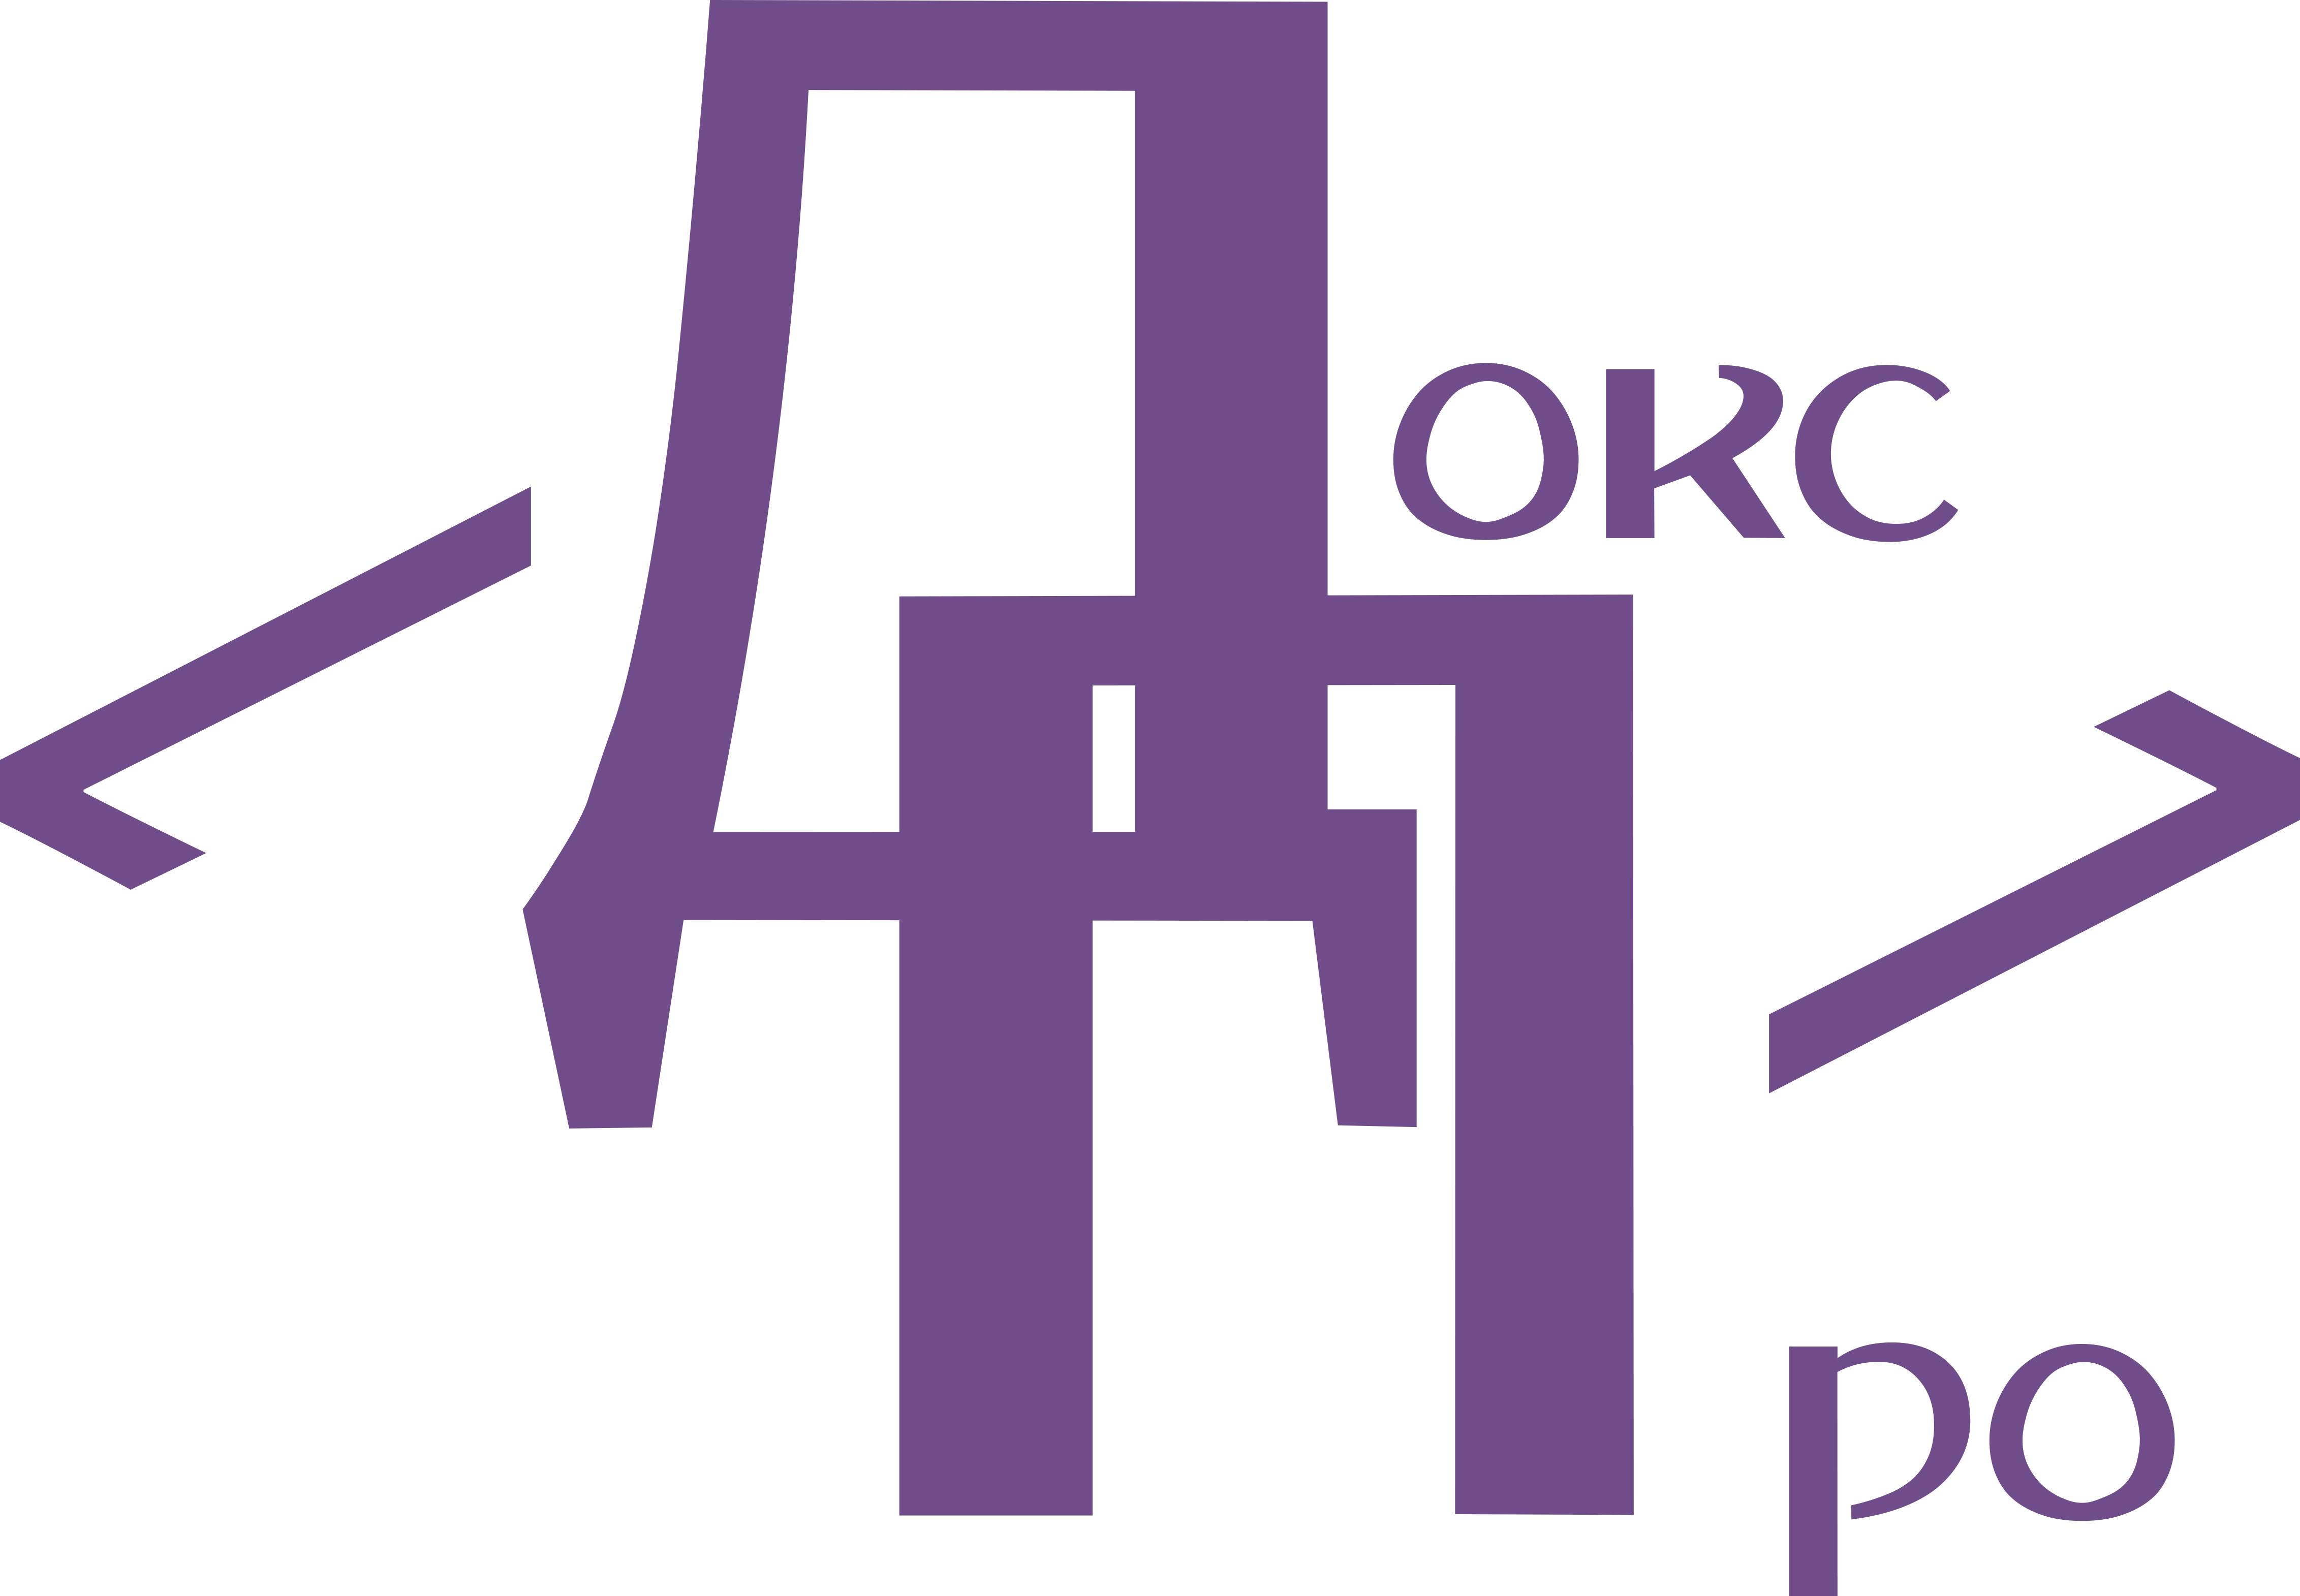 Разработка товарного знака/логотипа фото f_78159fb1980e55d0.jpg